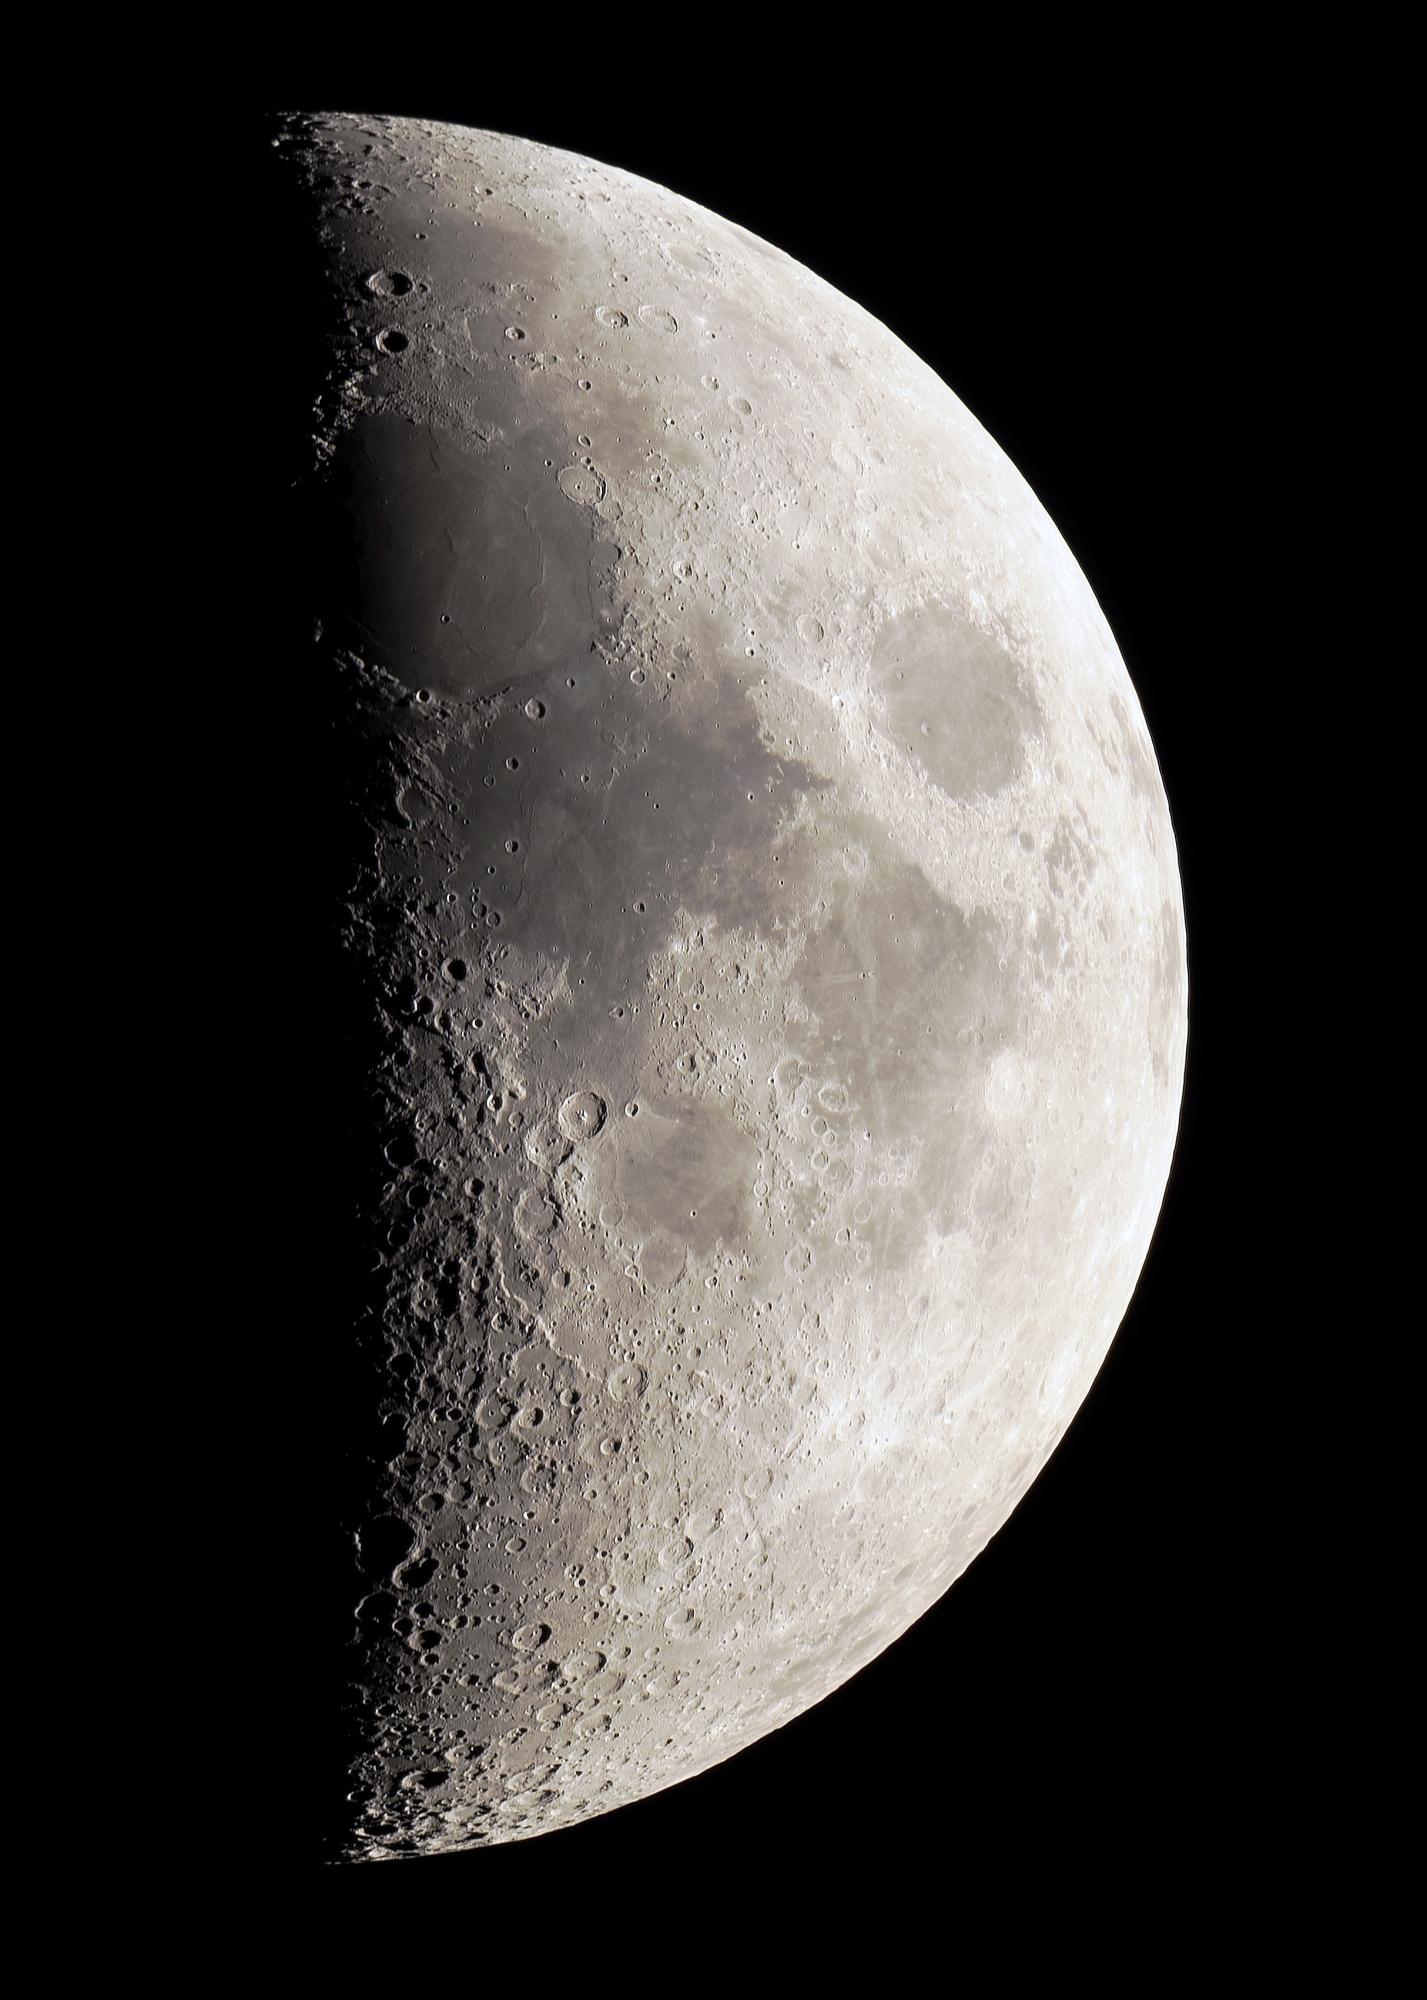 5d728db1d6ad6_lune050919(100).jpg.5e2c1808ab8c5860c64f9c15ee782399.jpg